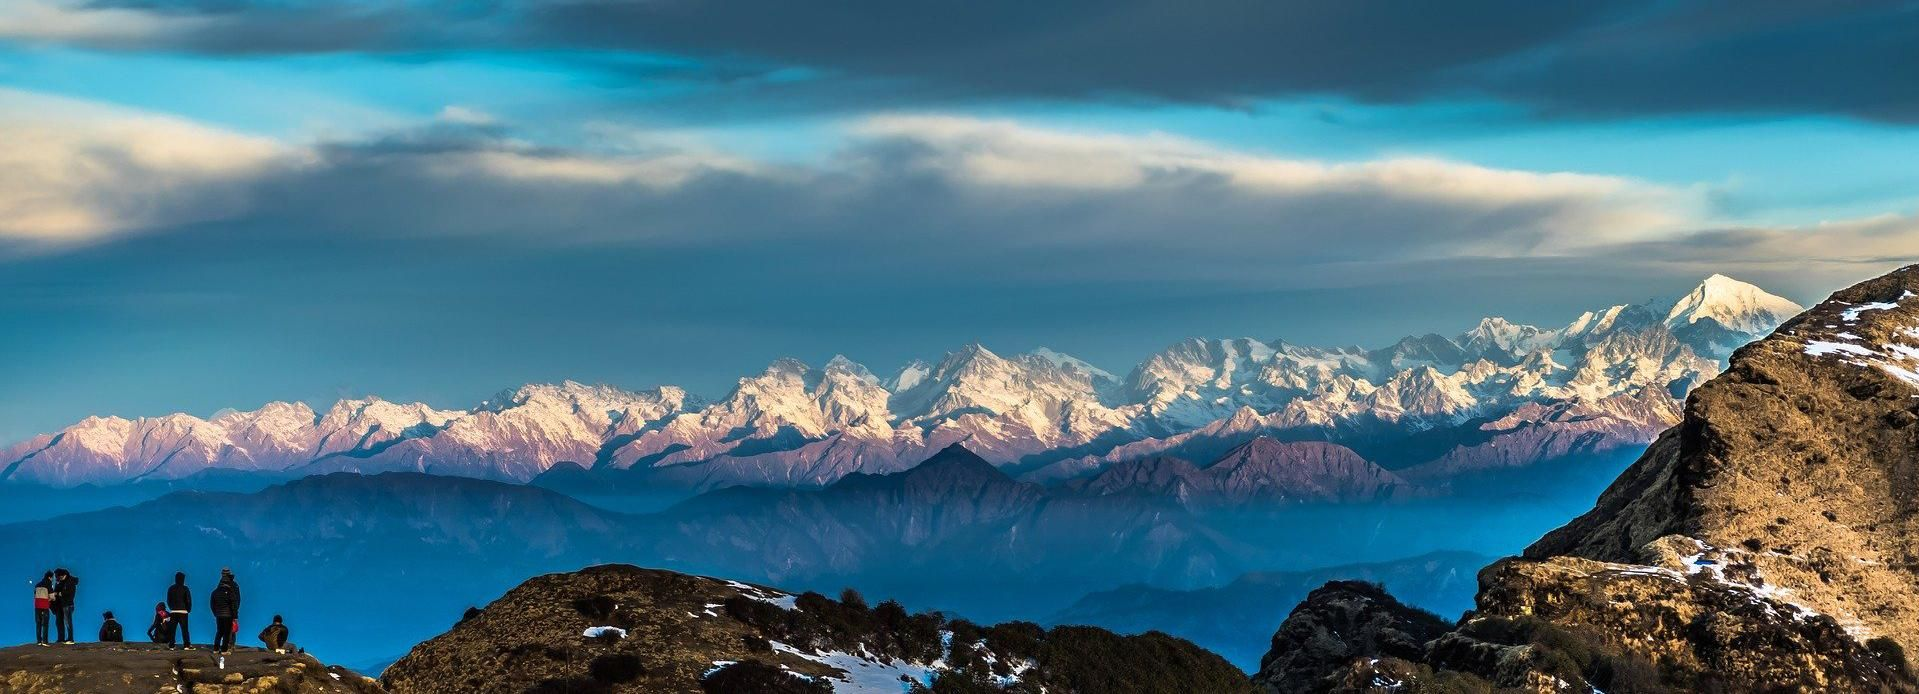 From Kathmandu: 3-Day Trek to Nagarkot via Chisapani